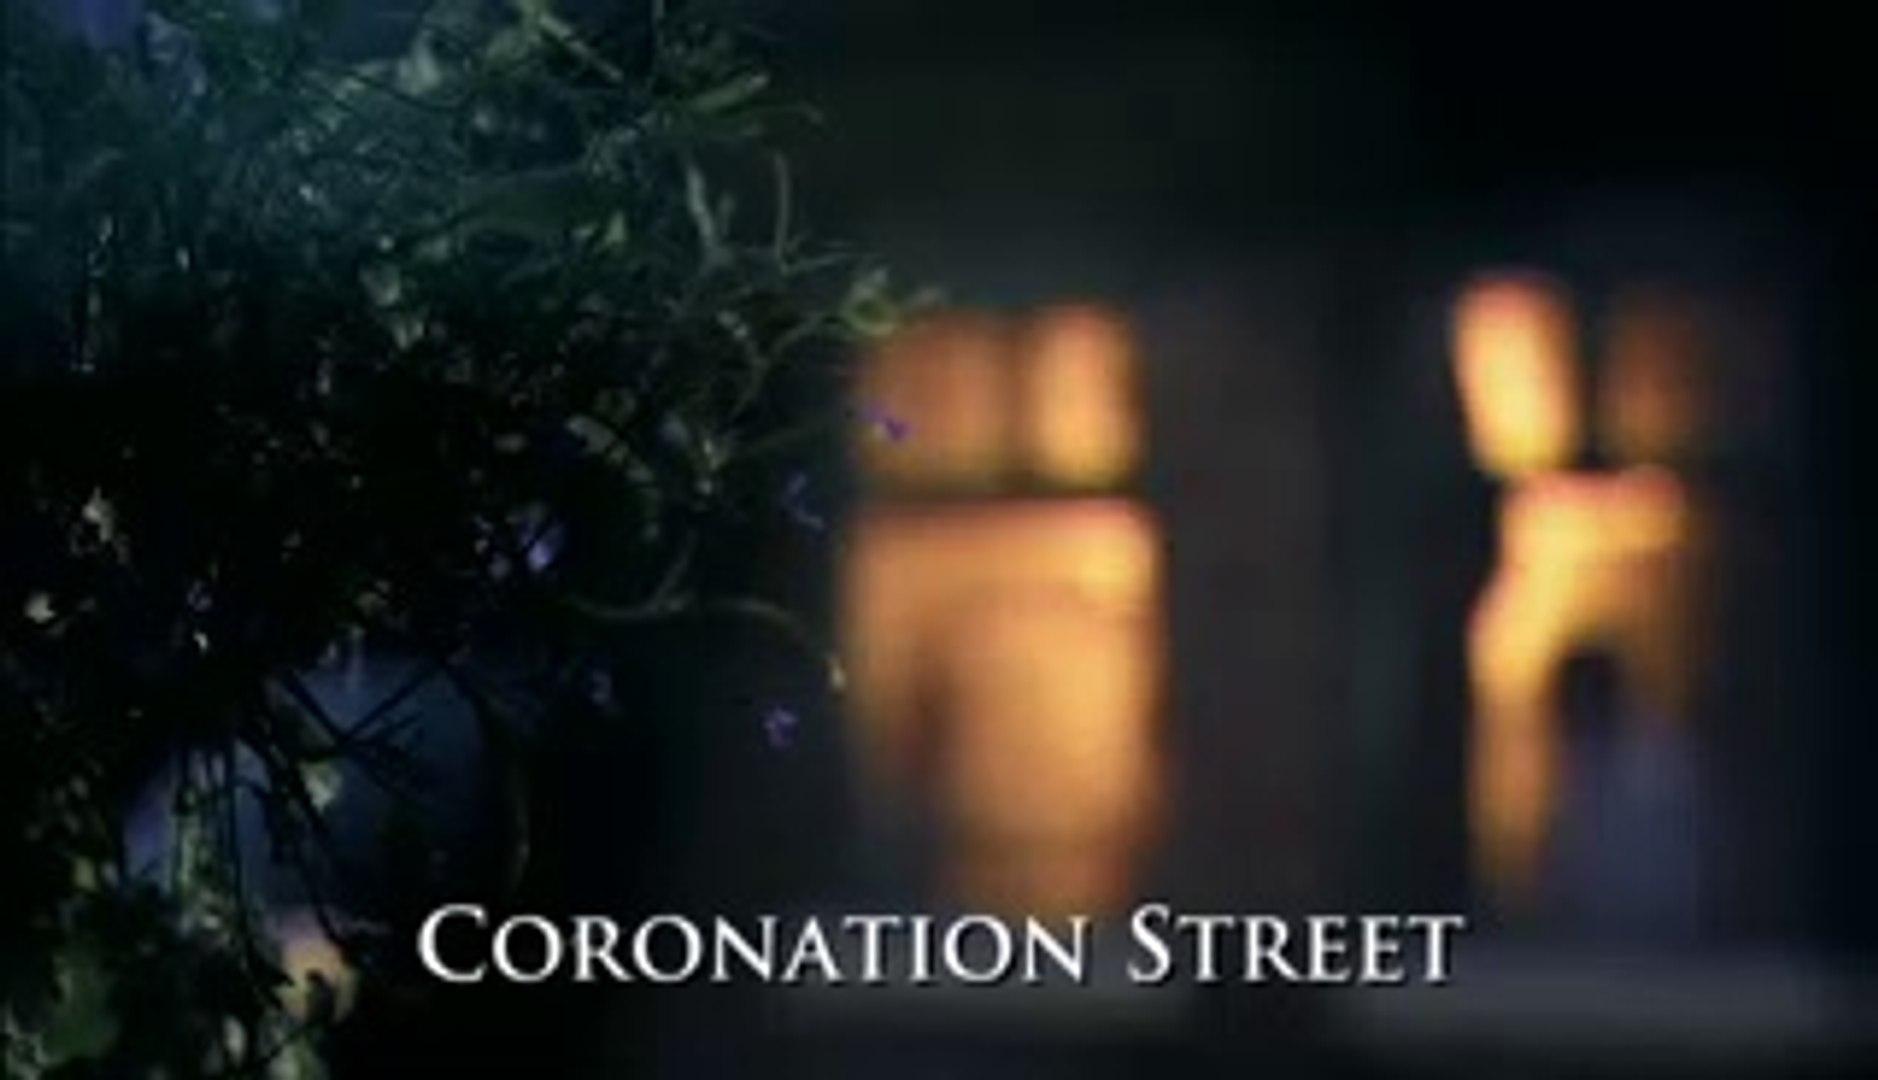 Coronation Street 5th March 2018 Part 2